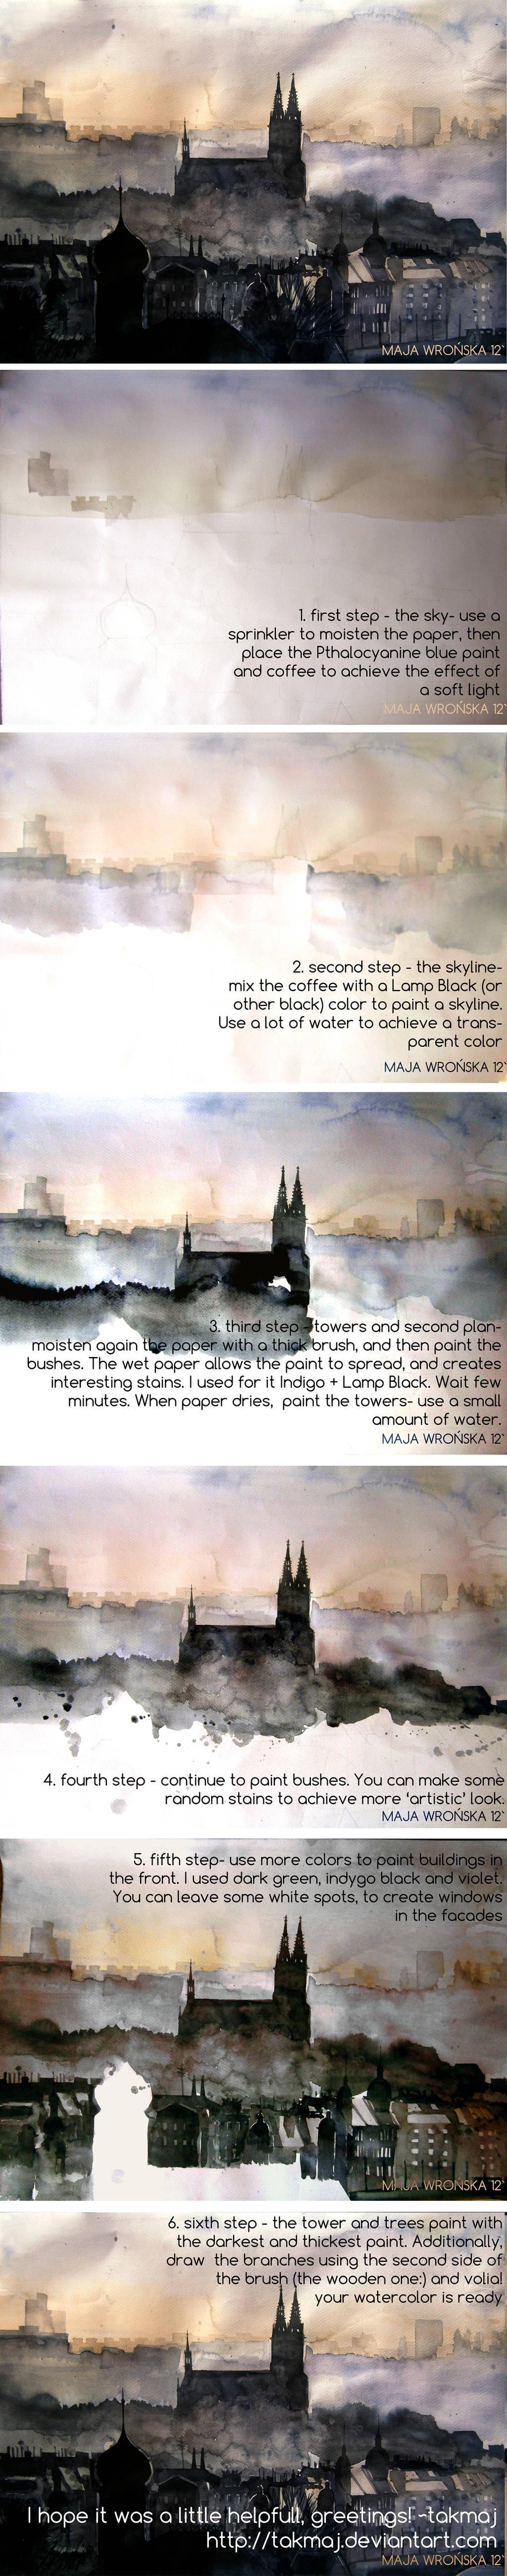 Watercolor tutorial by takmaj